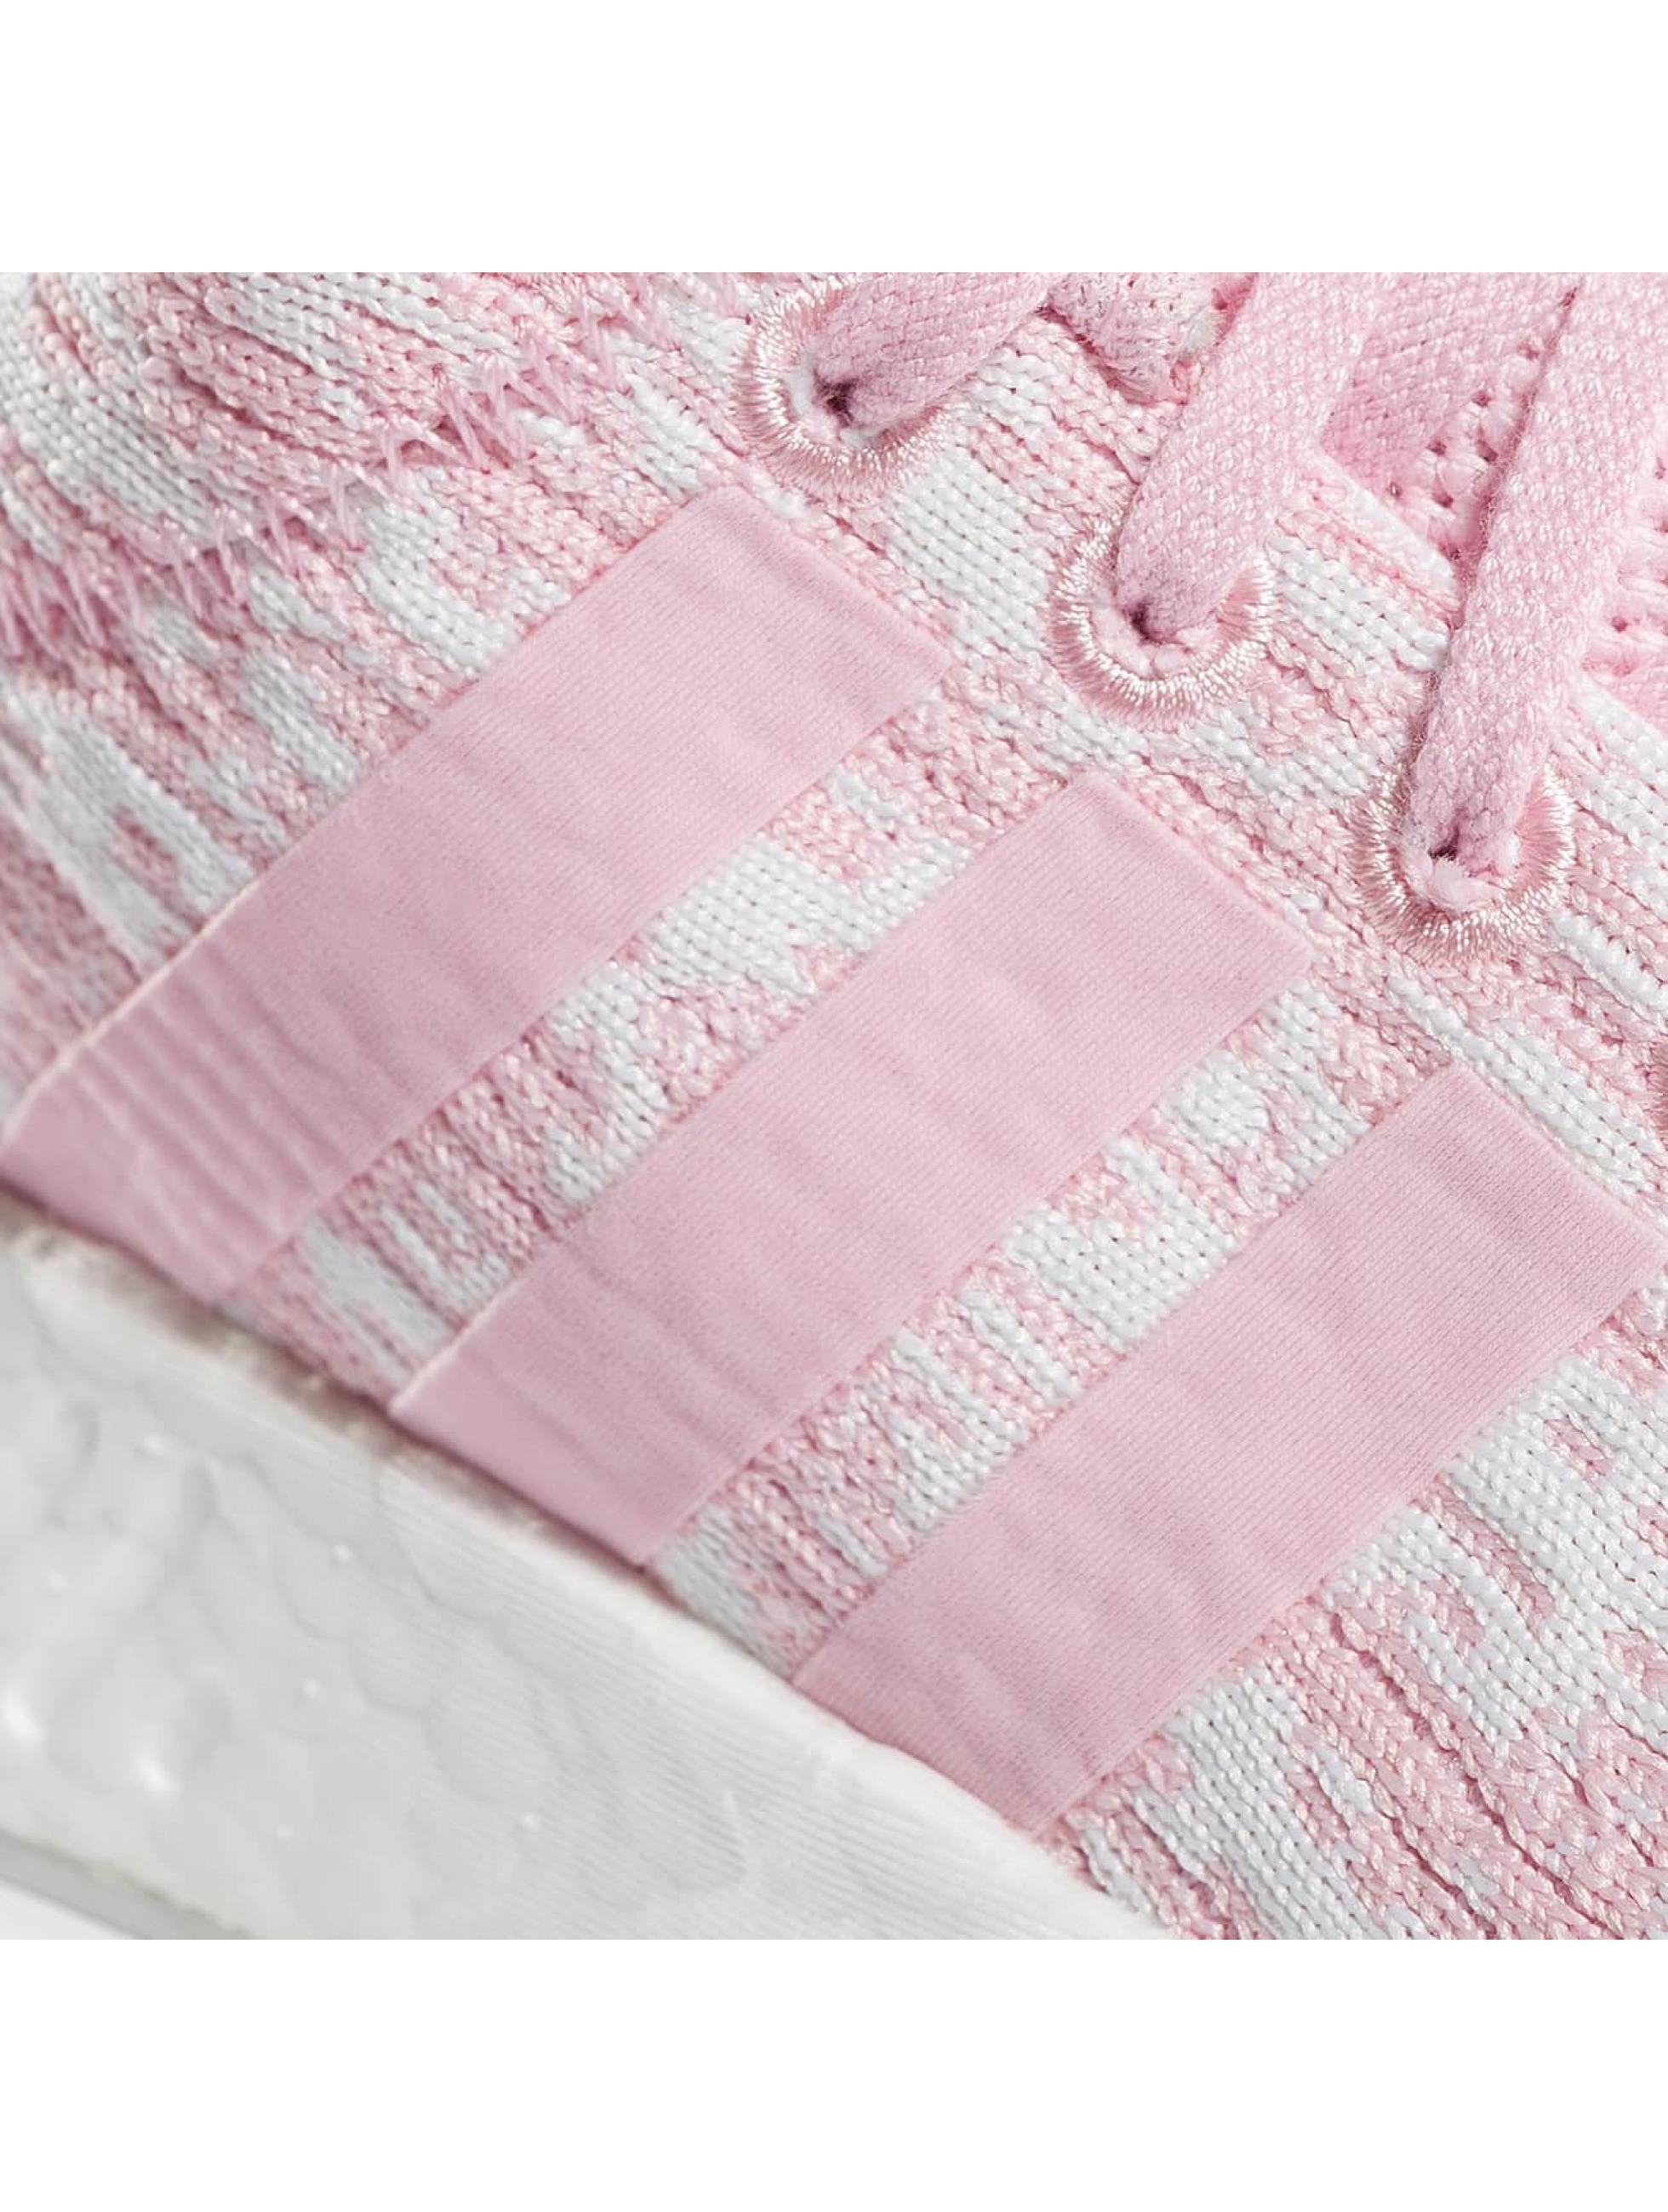 adidas originals Sneakers NMD_R2 W rosa